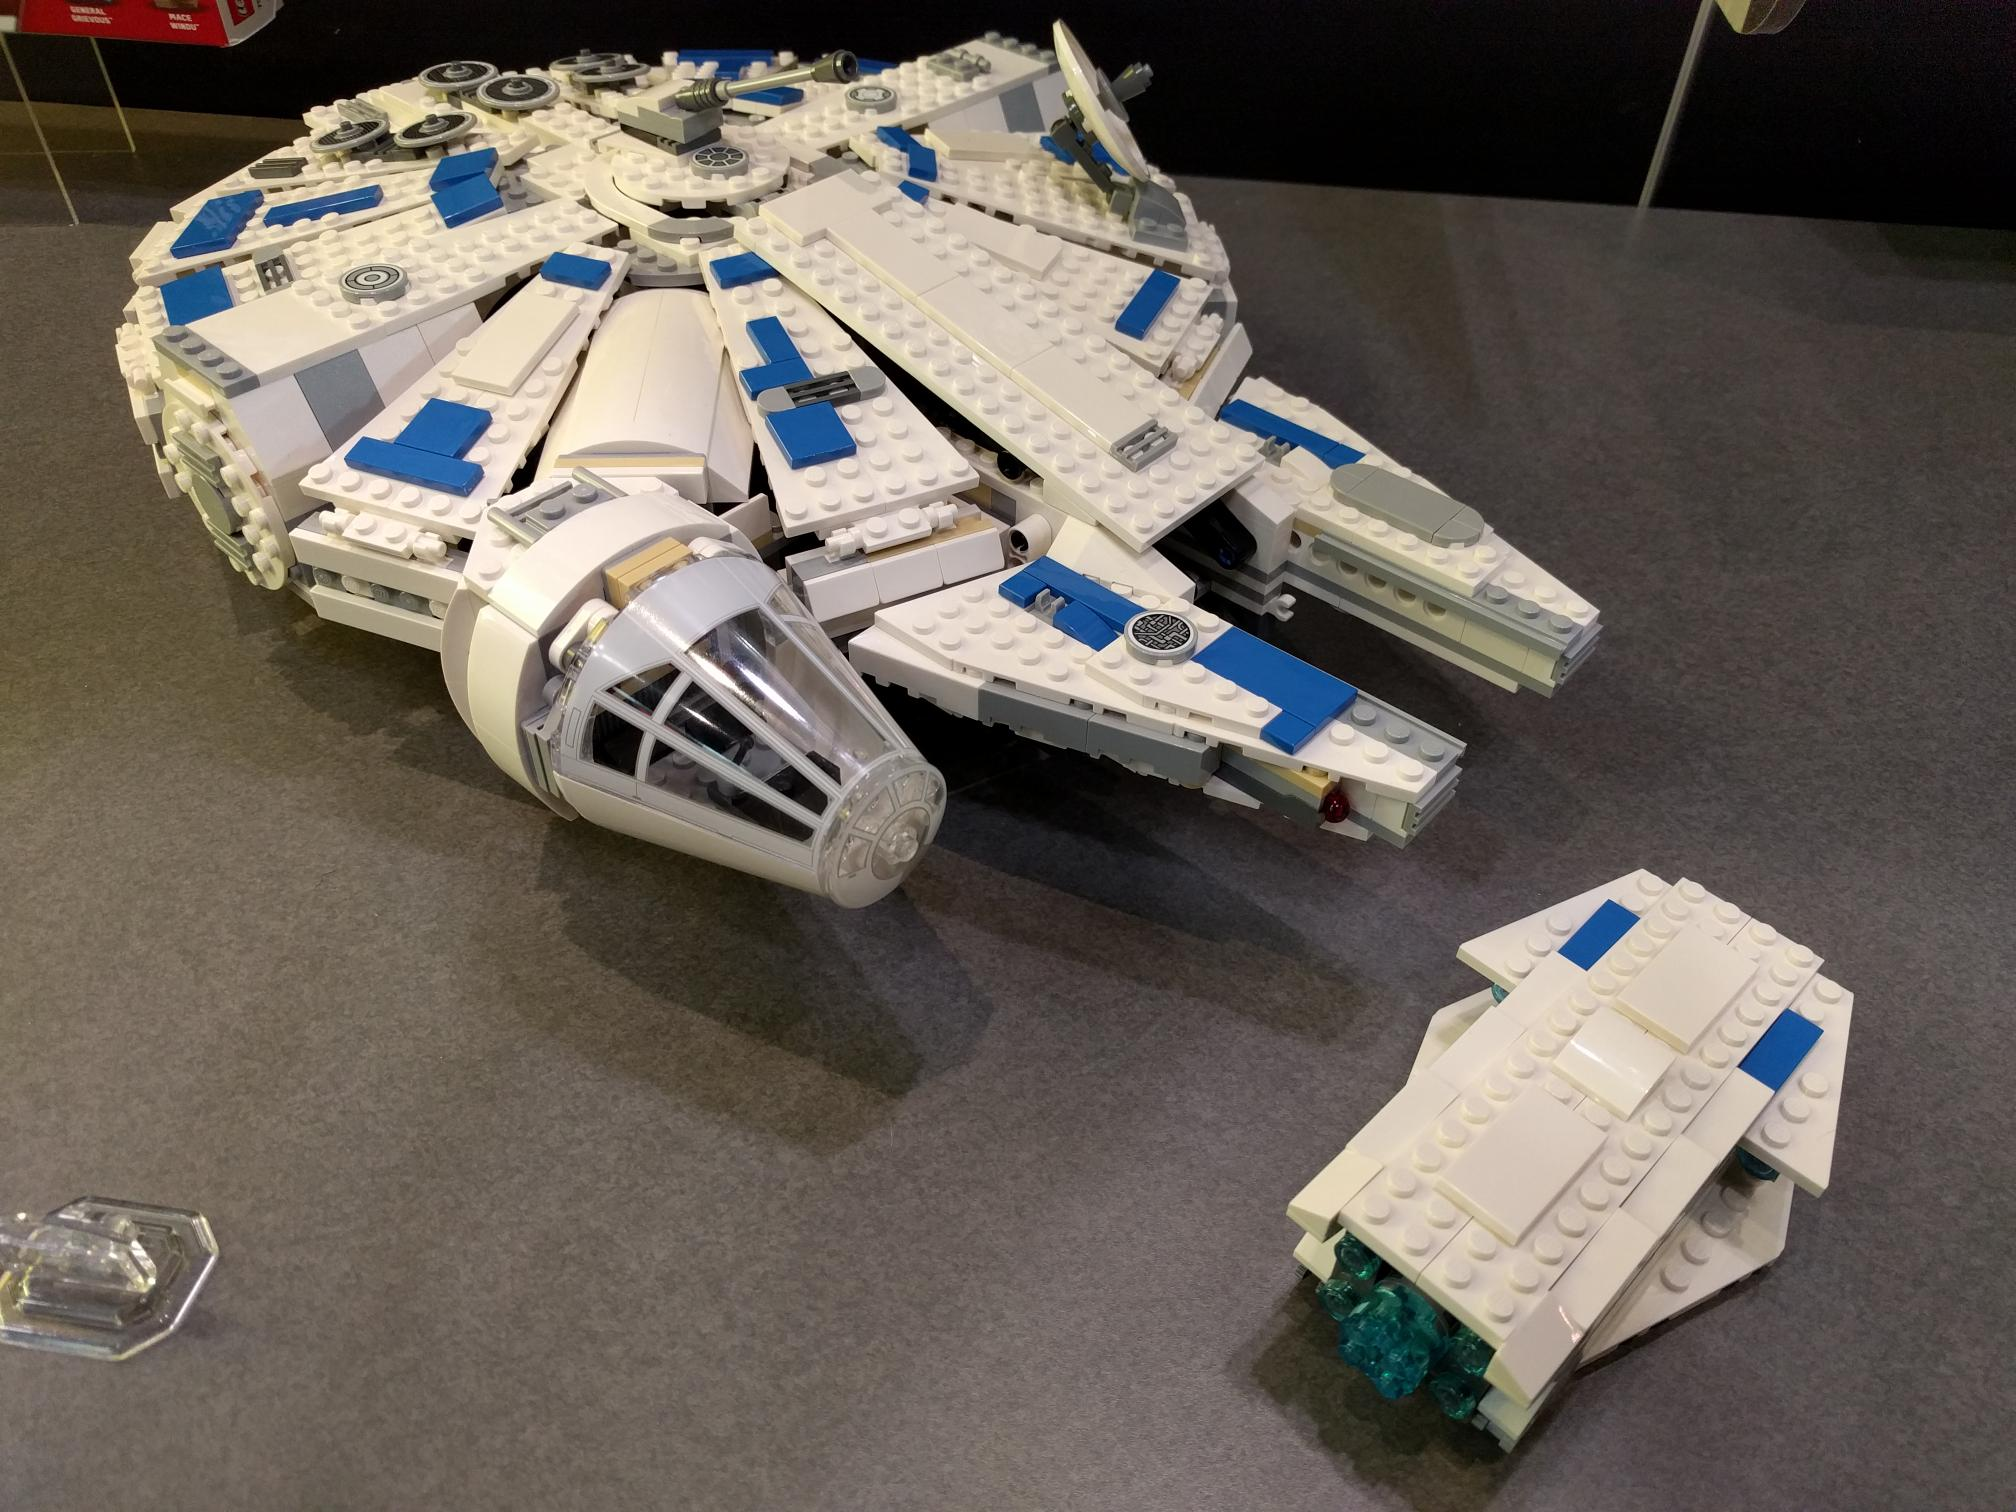 More information about 75212 Kessel Run Millennium Falcon | Brickset ...